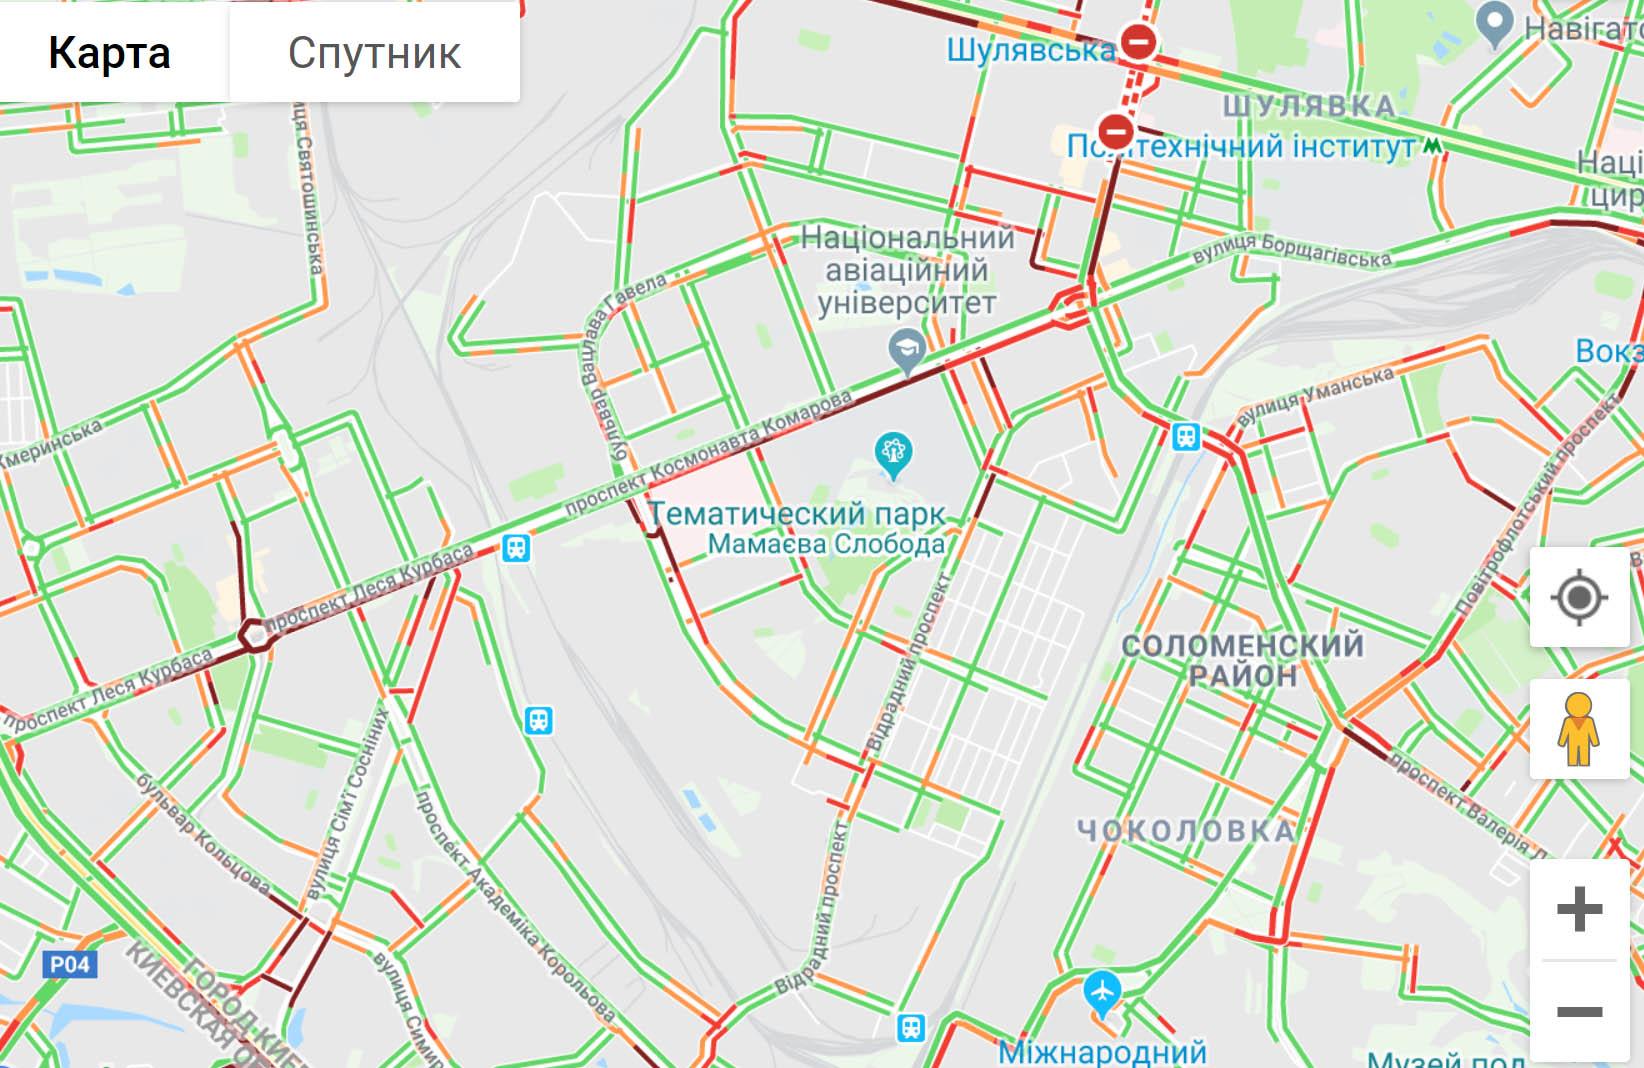 68khn Ранкові затори на дорогах Києва - 23.04.2019